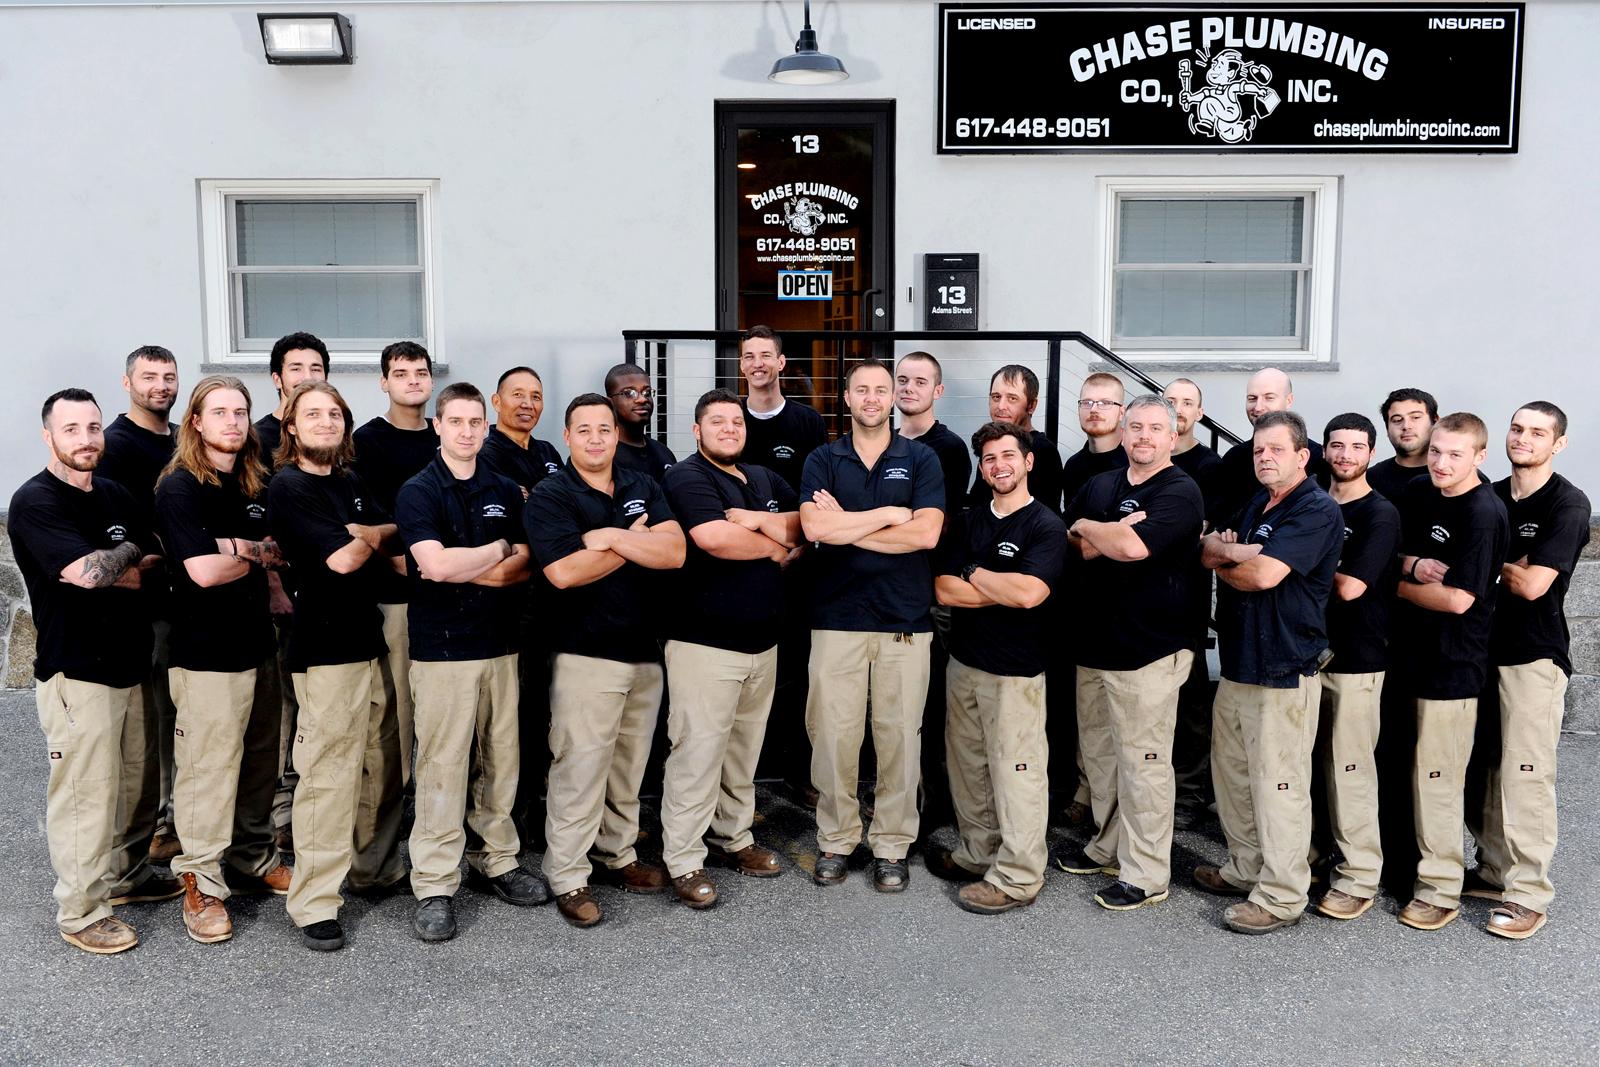 Chase Plumbing Team